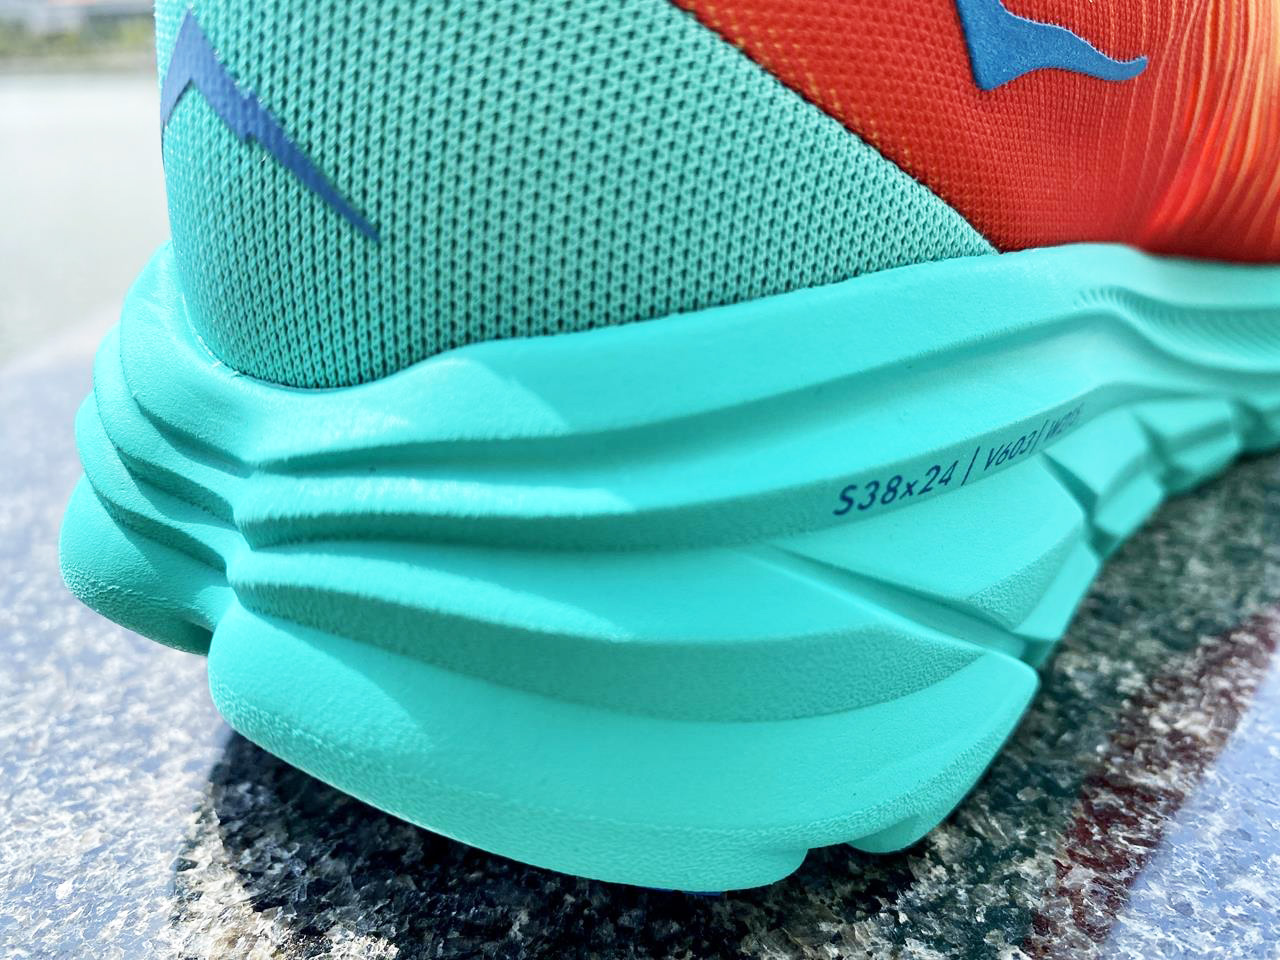 Hoka One One Rincon 3 - Heel Closeup